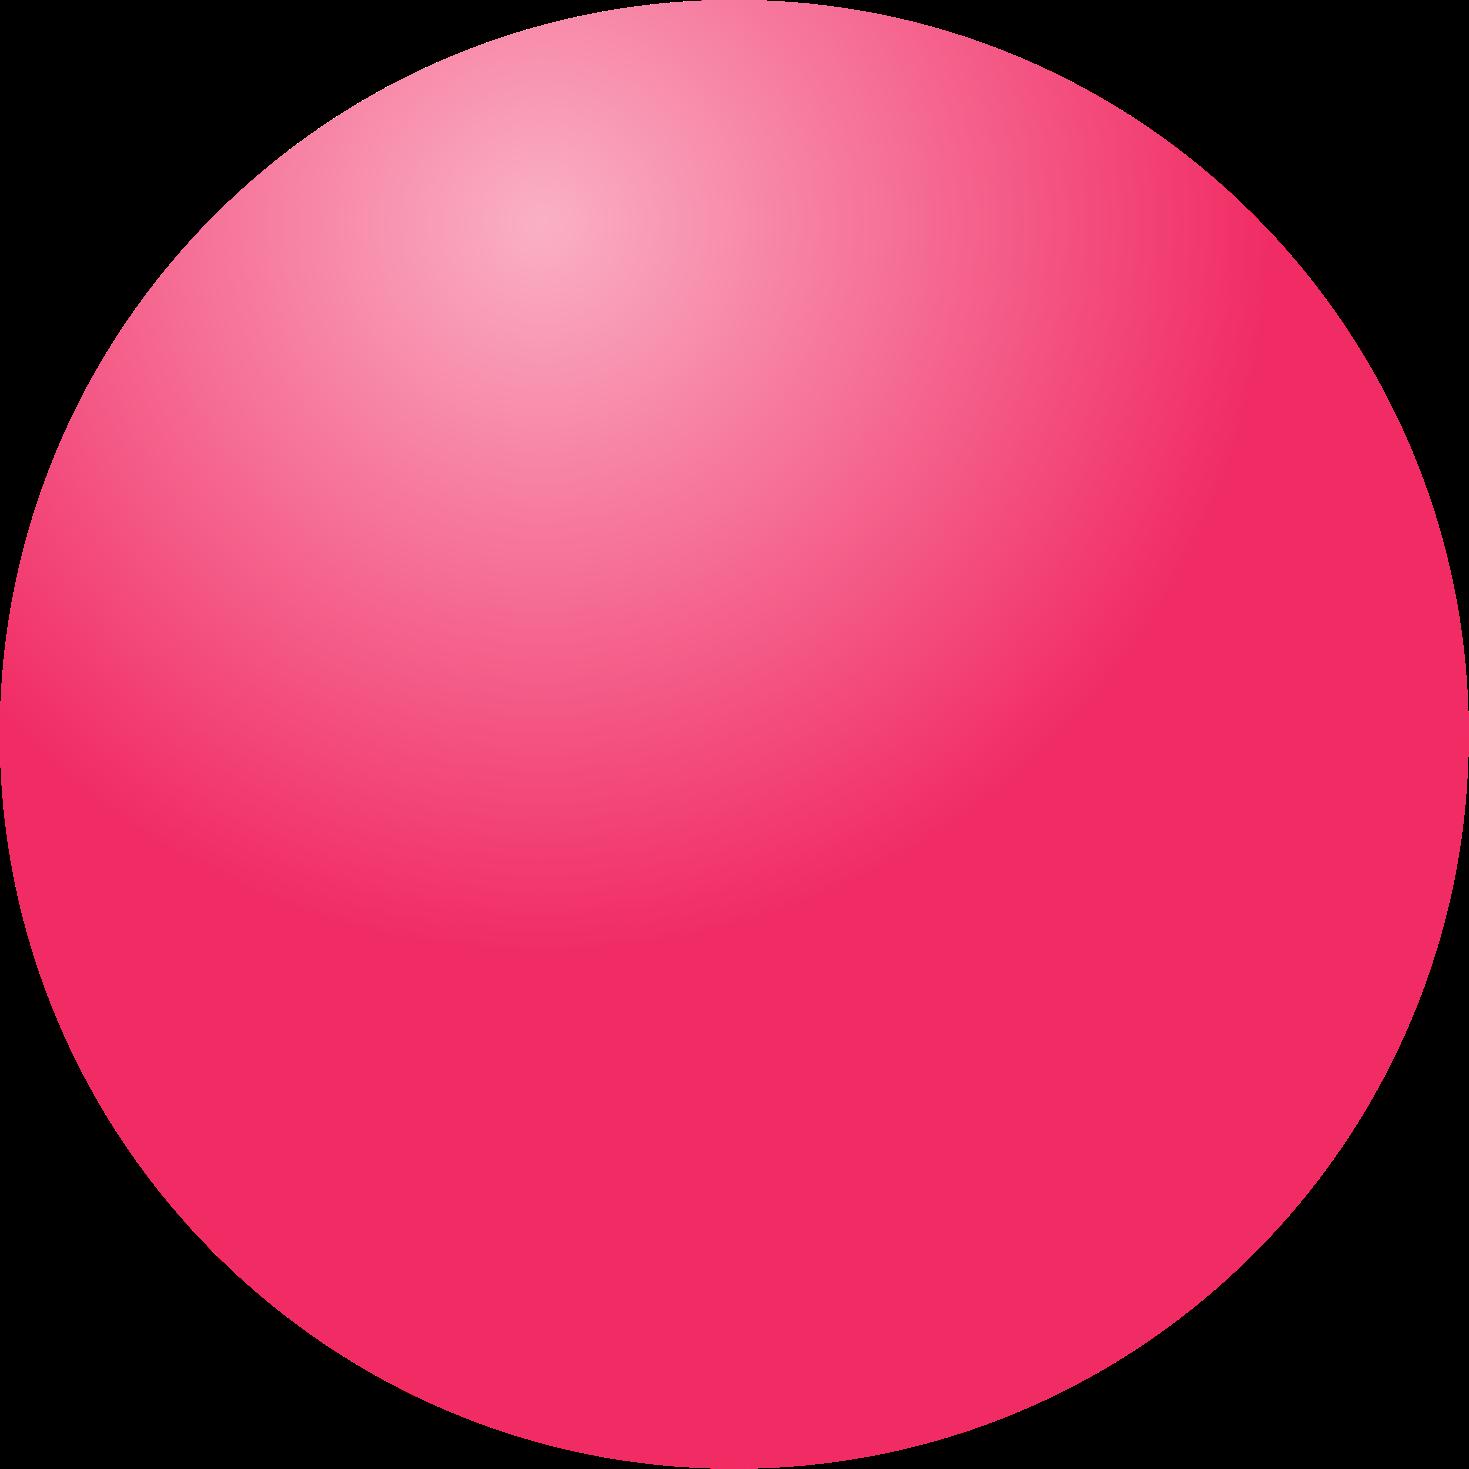 Proton clipart clipart download Pink Proton Vector Clipart image - Free stock photo - Public ... clipart download